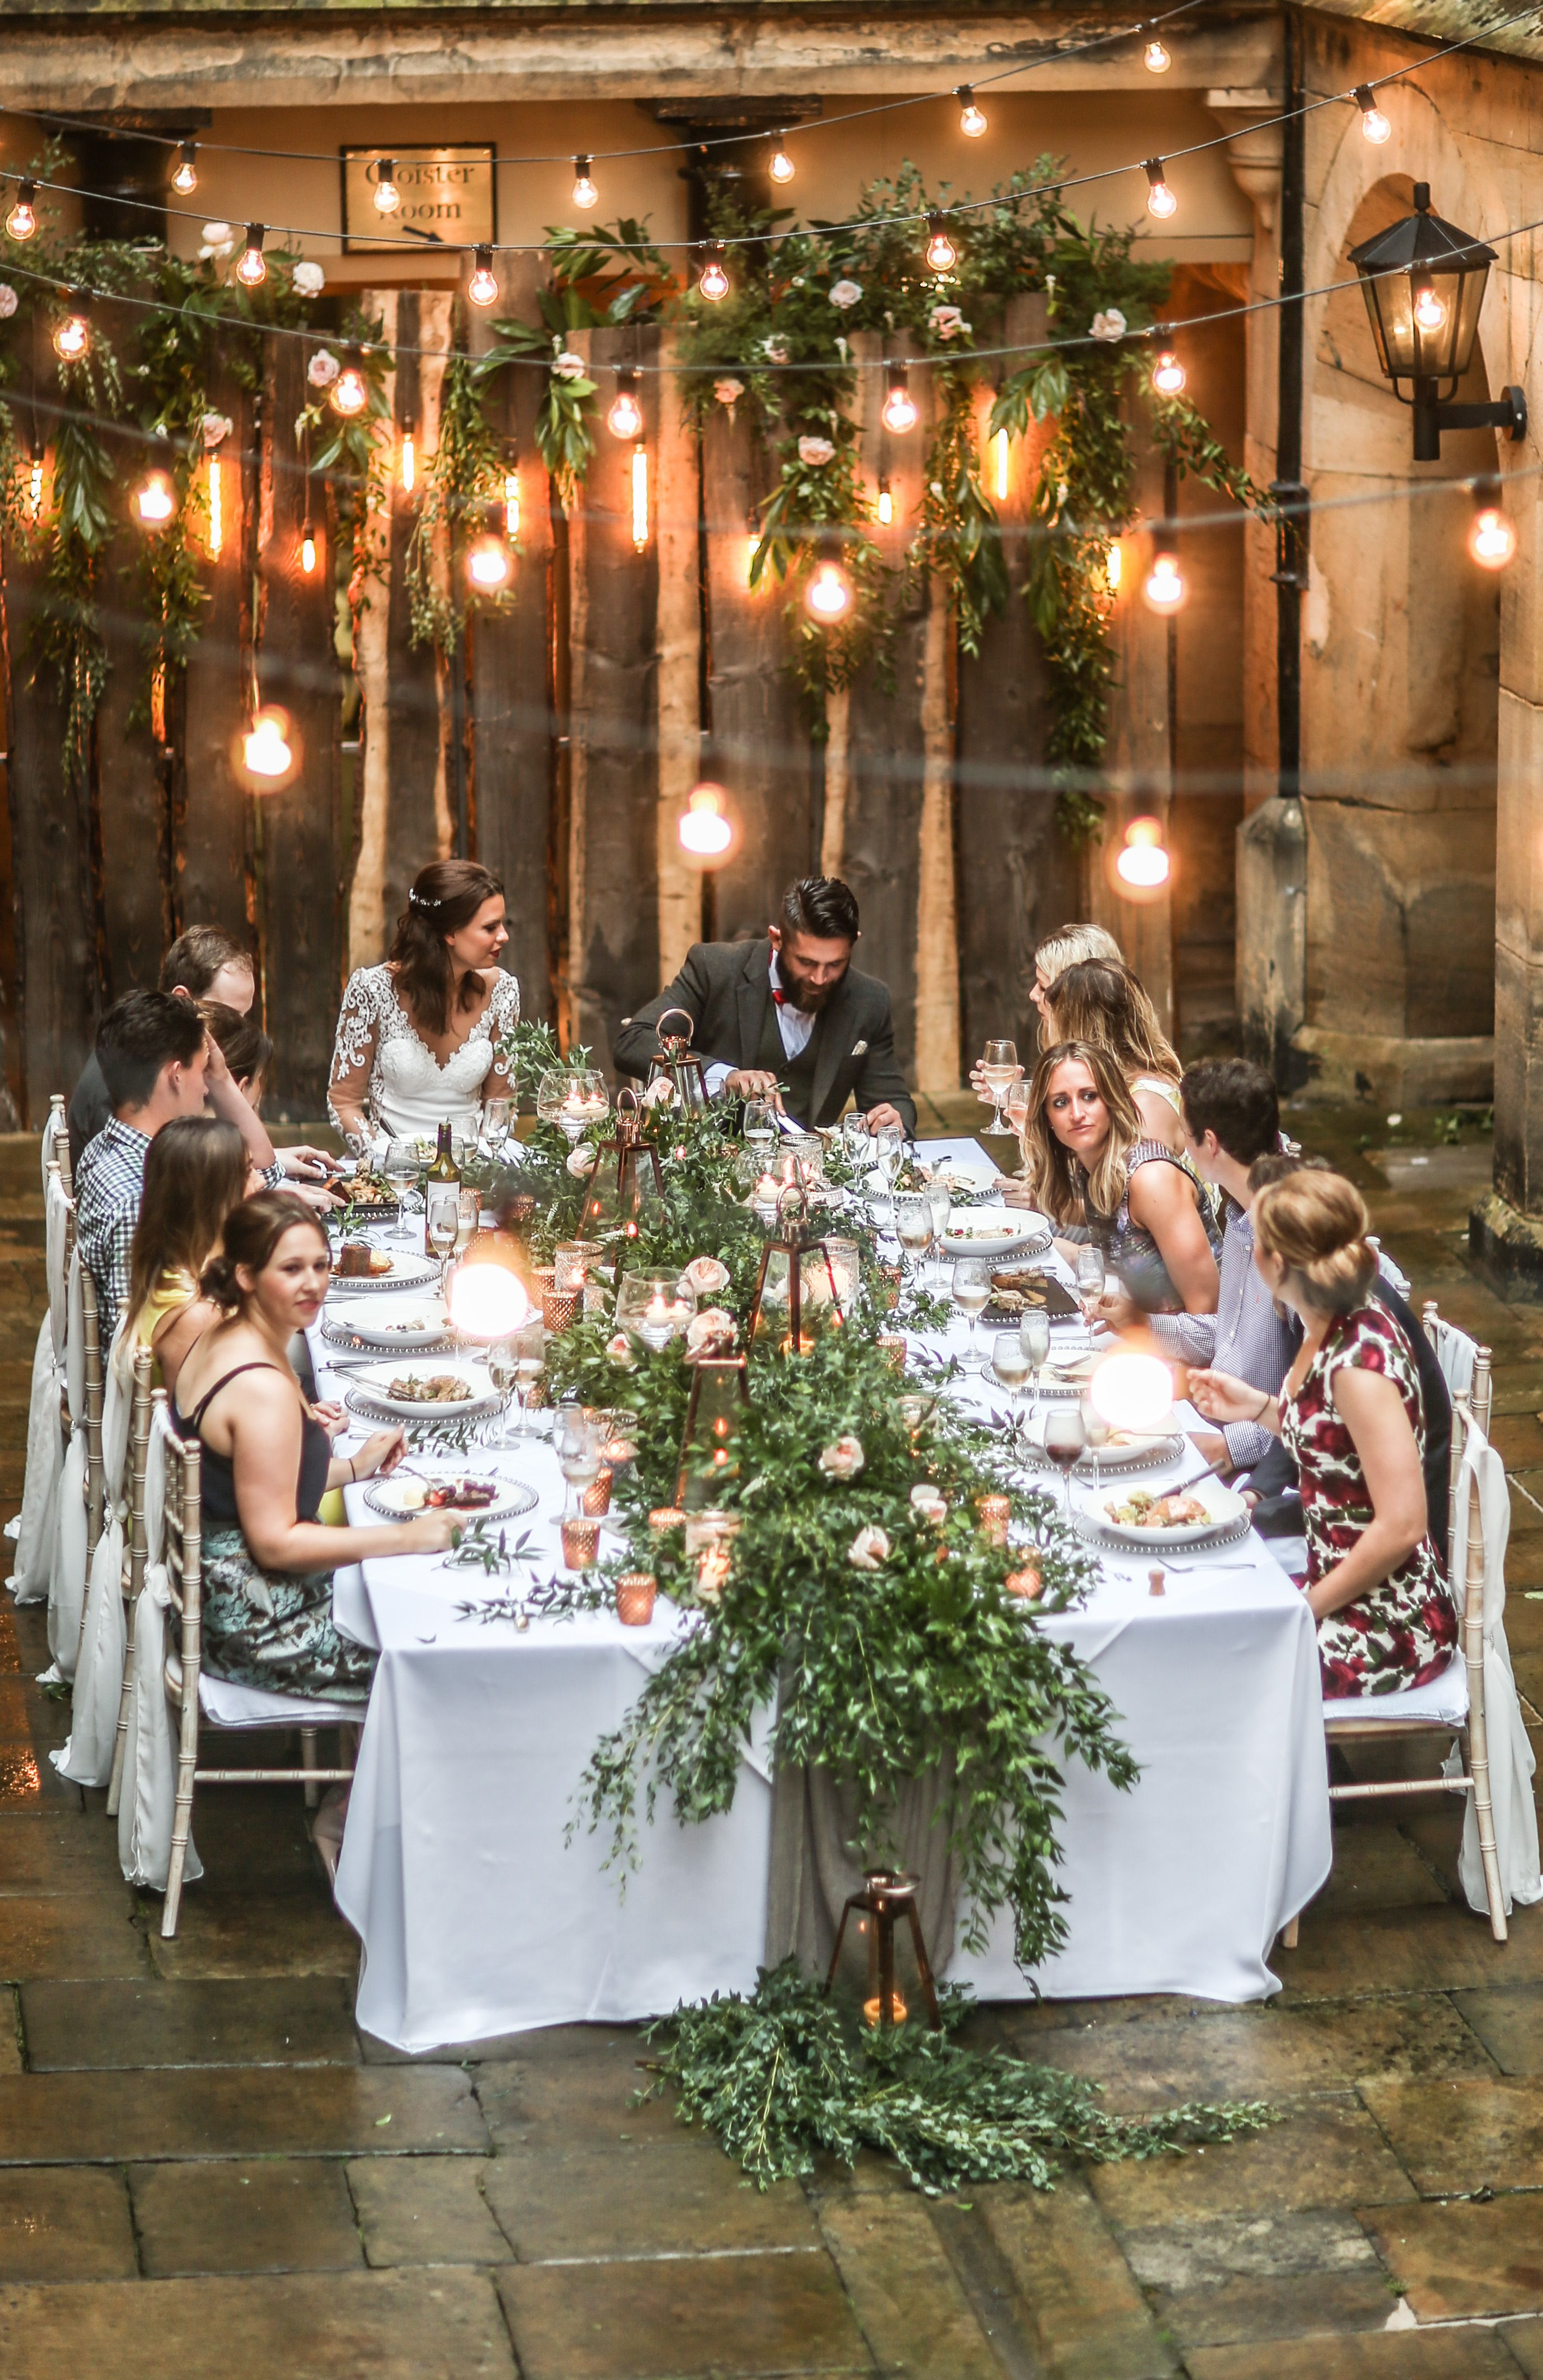 Alfresco Dining Italian Inspired Courtyard Wedding In The Heart Of Northumberland U Wedding Reception Seating Italian Wedding Themes Garden Wedding Reception